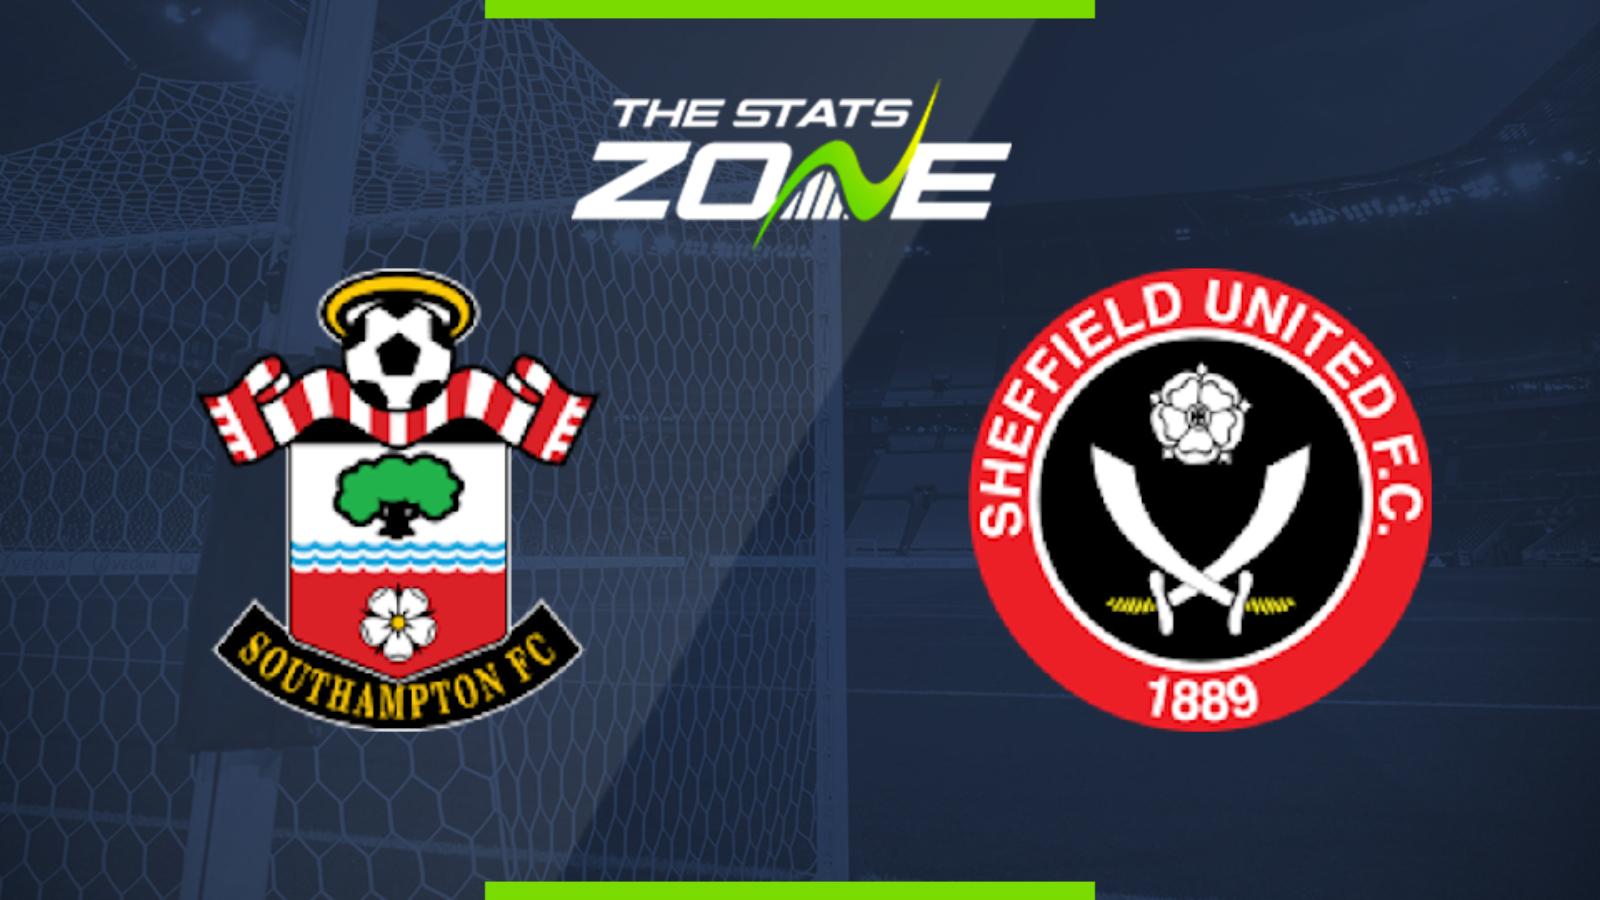 sheffield united vs southampton - photo #33